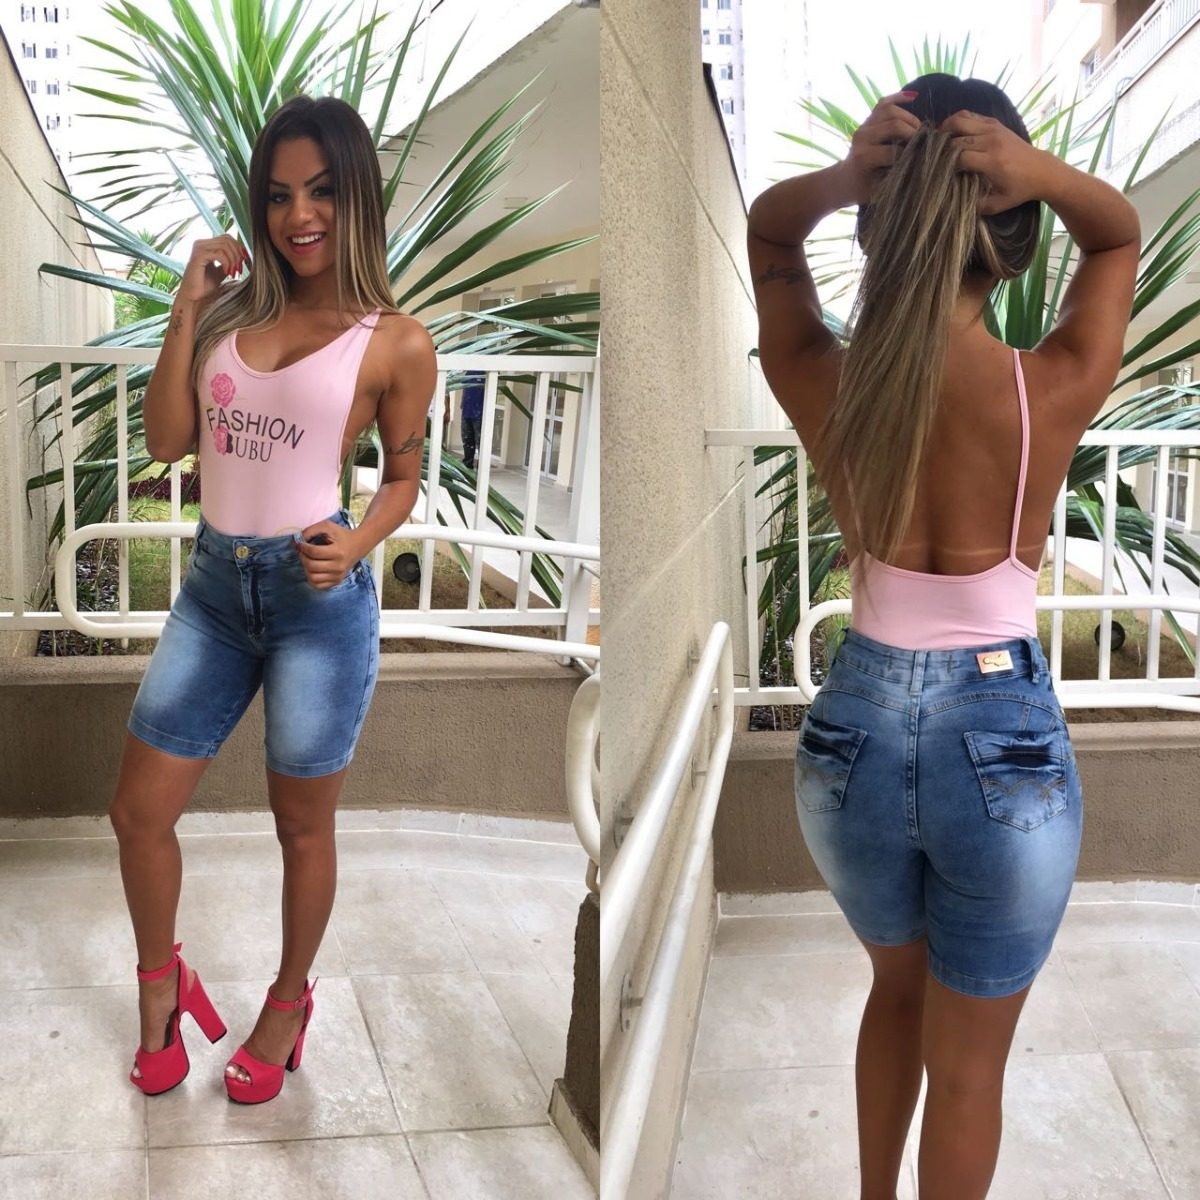 684a7879f Carregando zoom... kit 3 bermuda shorts jeans hot pants roupas feminina da  moda